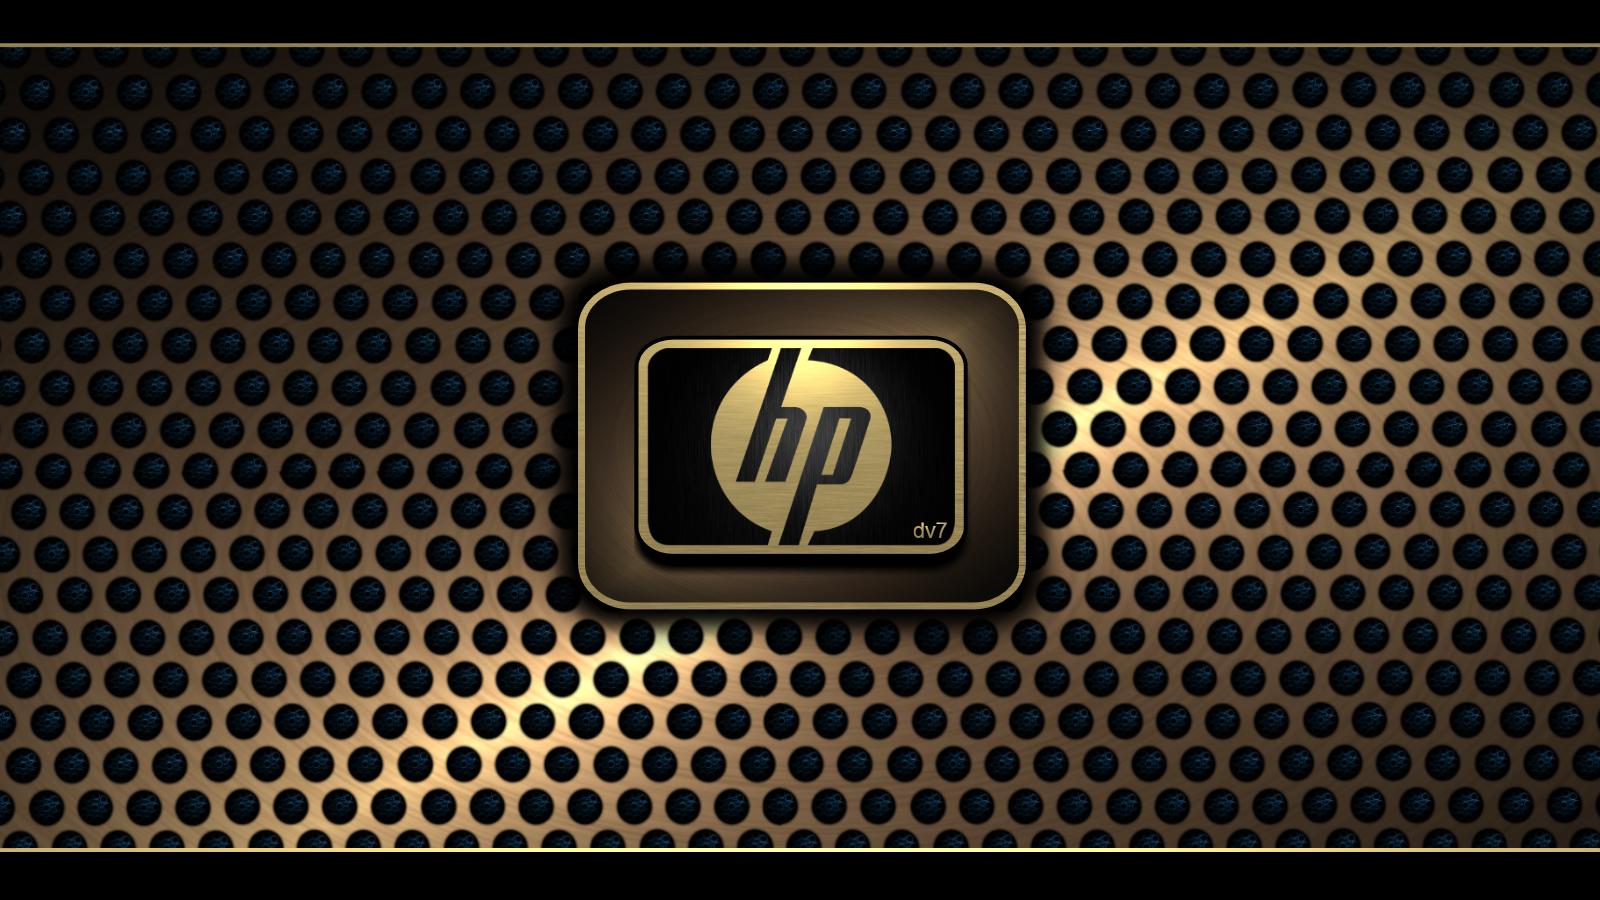 hp desktop wallpapers Desktop Backgrounds for HD Wallpaper 1600x900